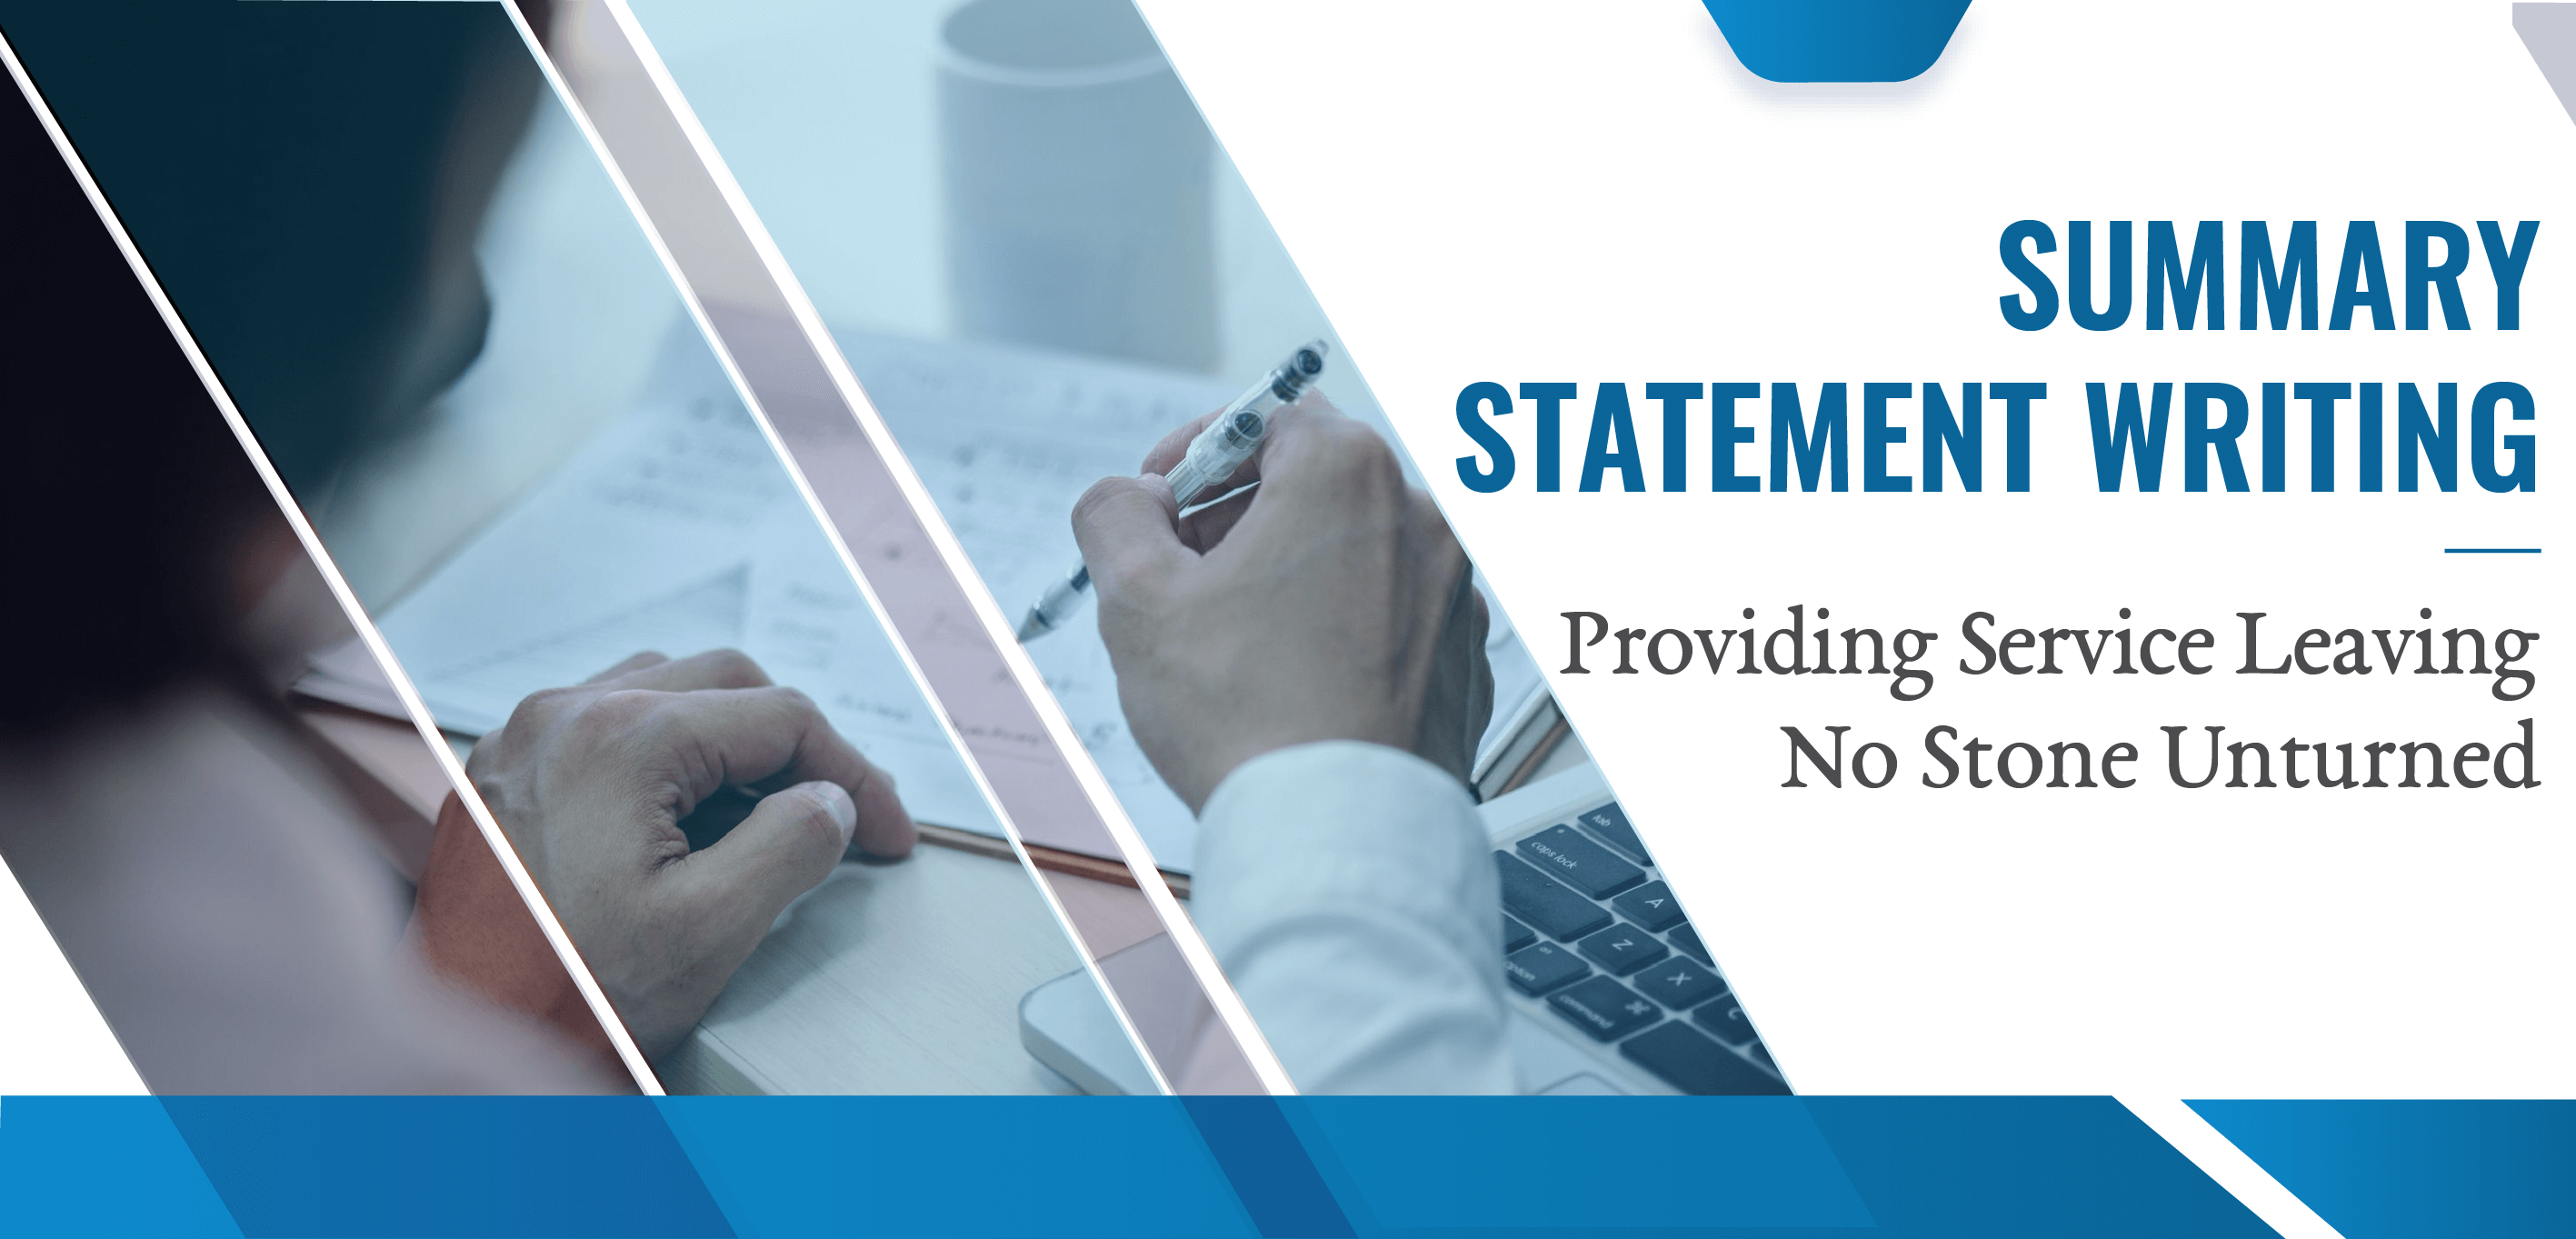 Summary statement writing